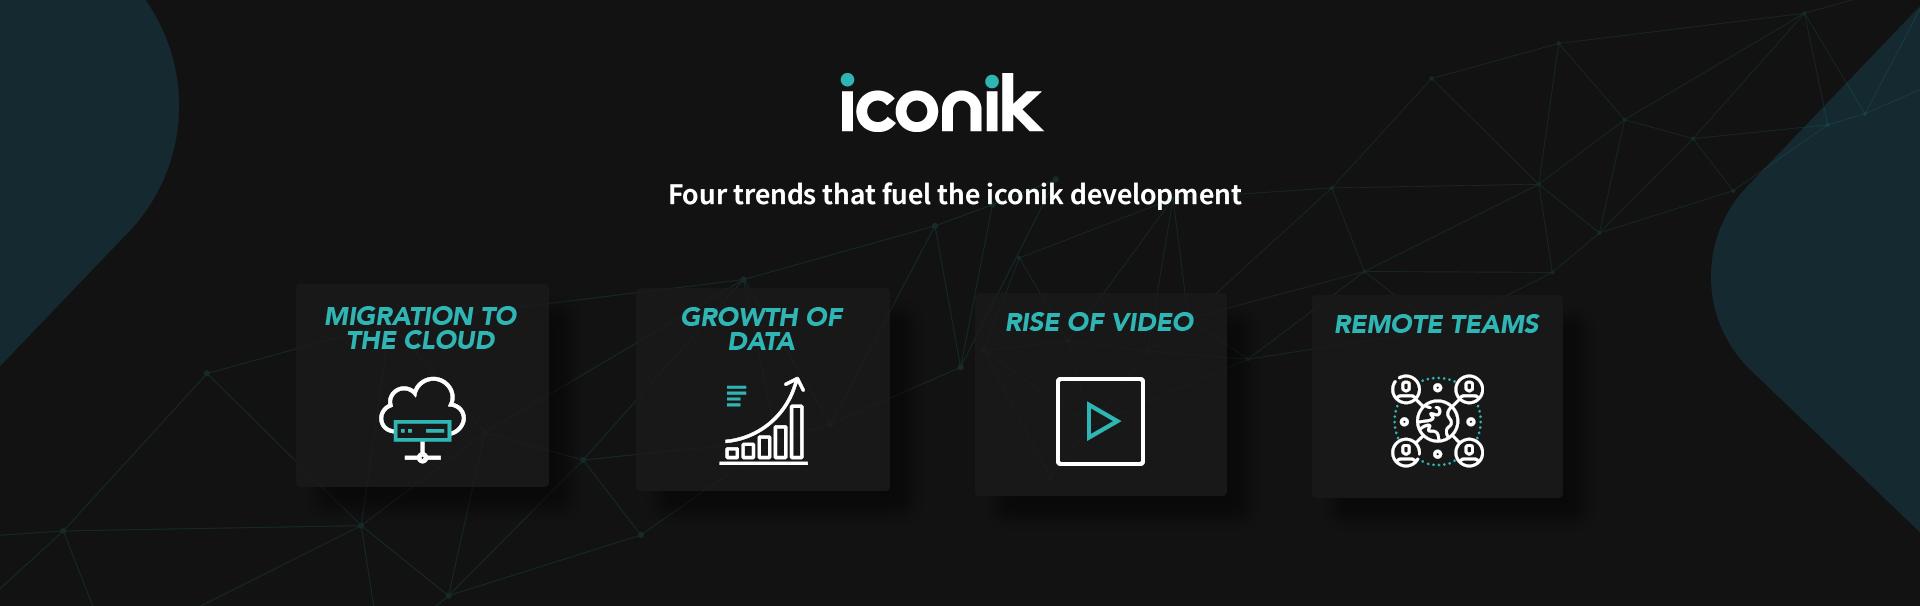 Market trends behind iconik